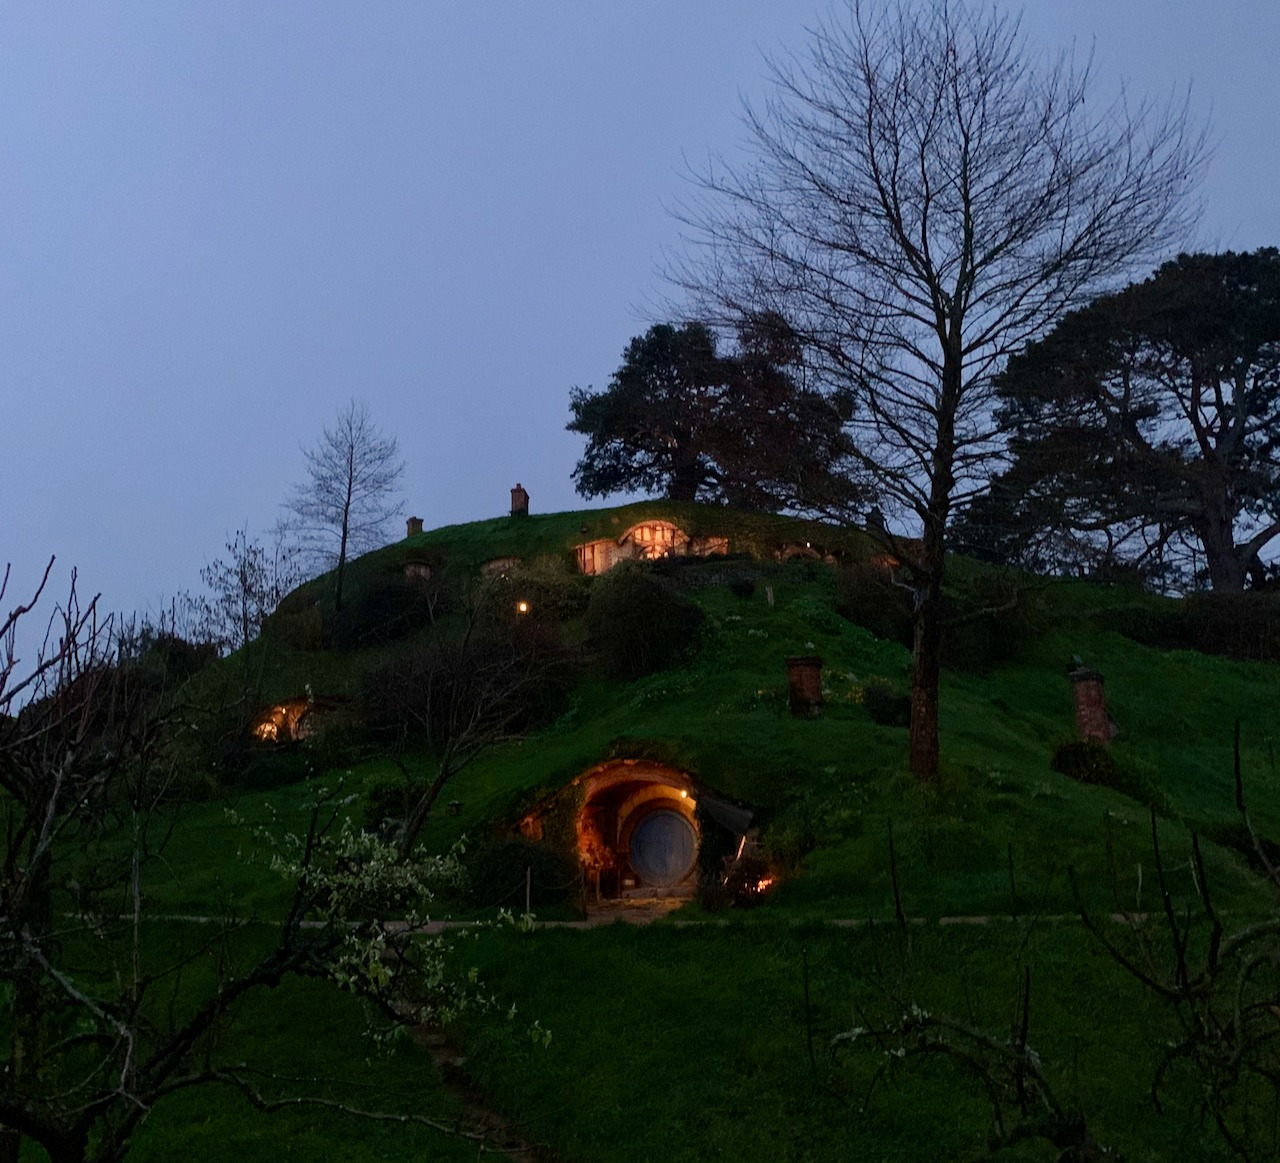 The Shire Hobbiton Evening Banquet Tour